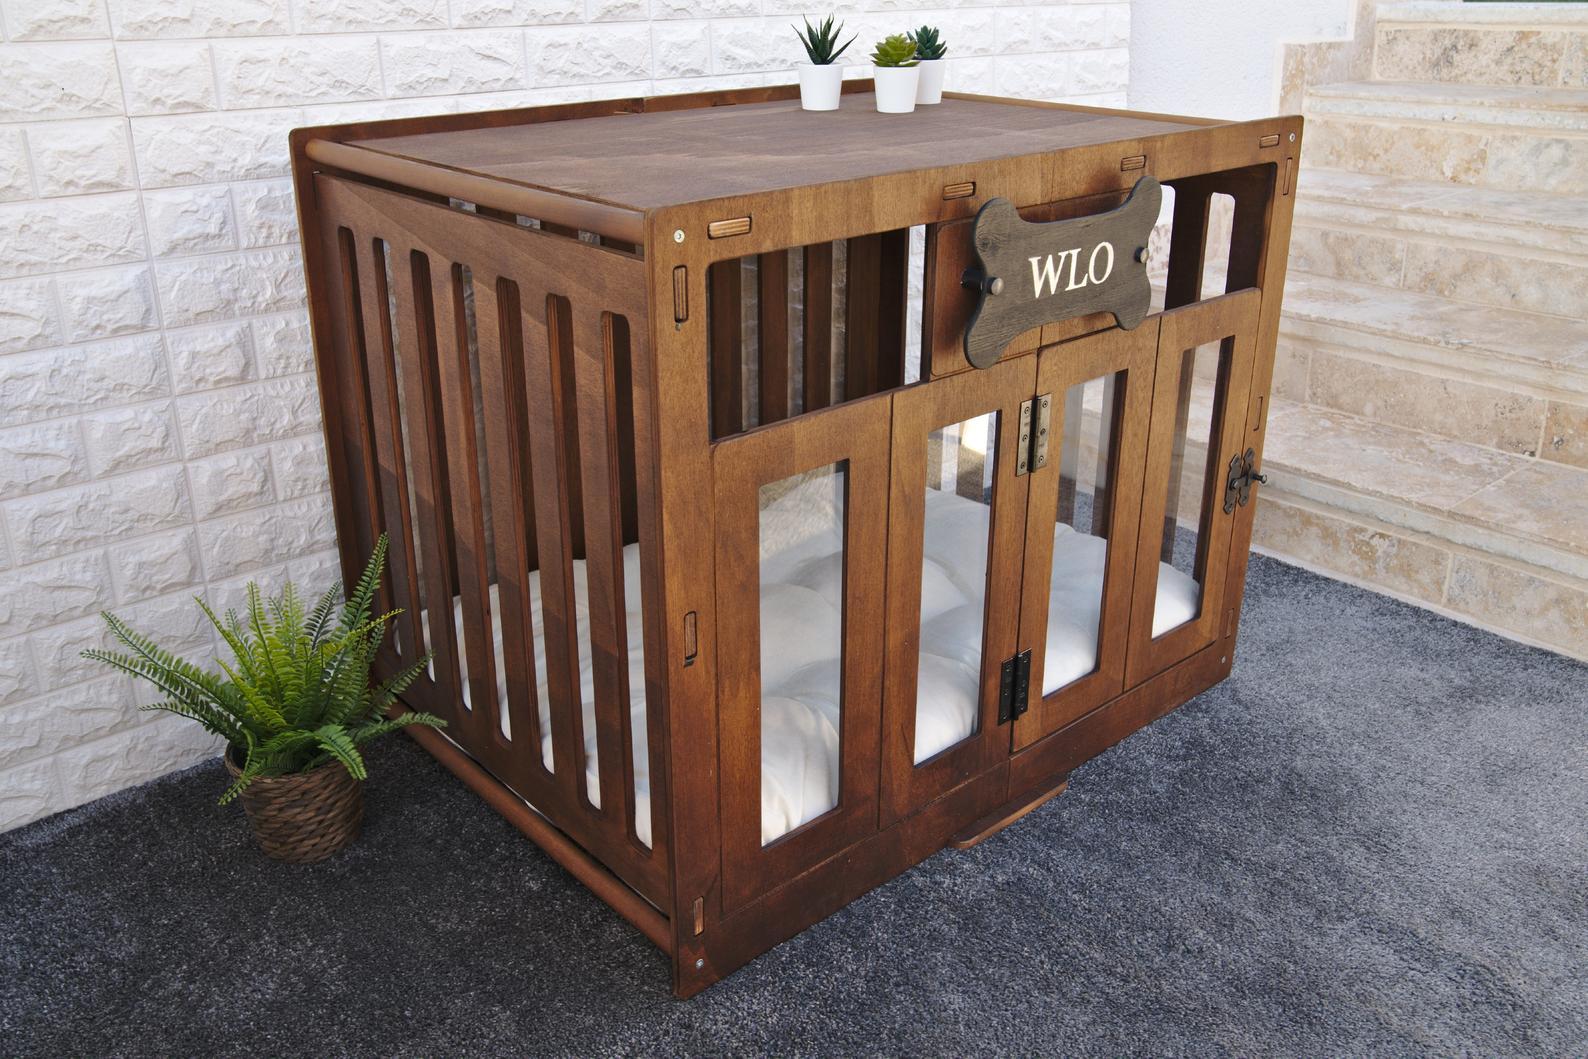 WLO Modern Wooden Dog House Crate via WLO Wood (Etsy)